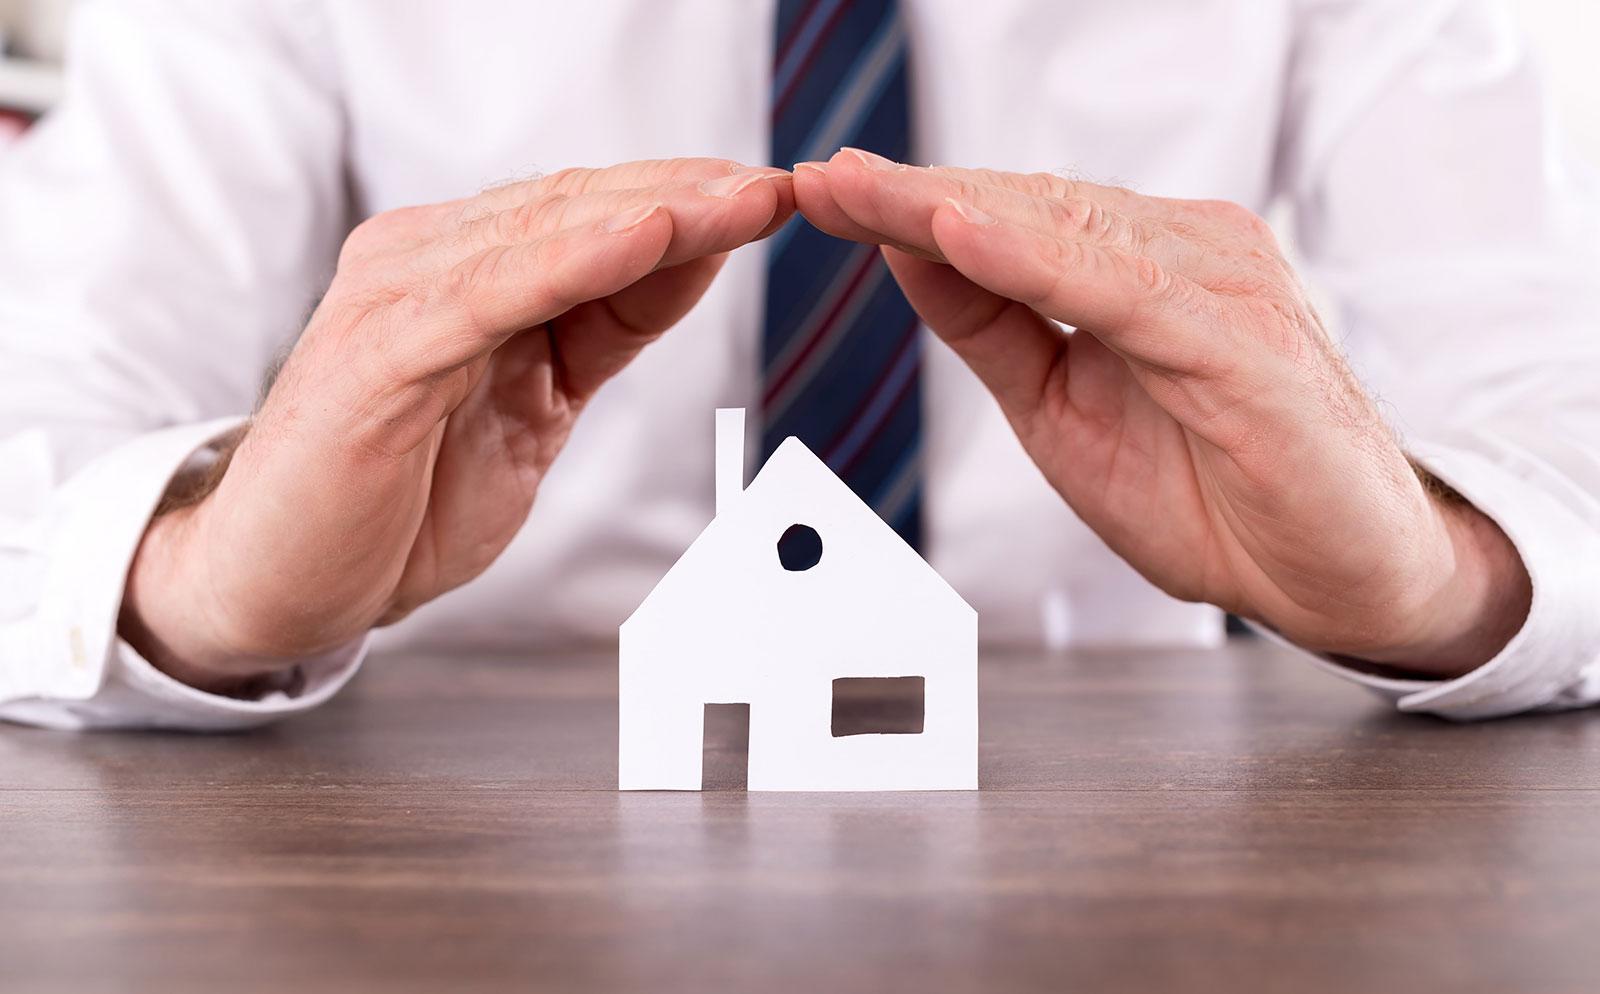 assurance habitation colocation